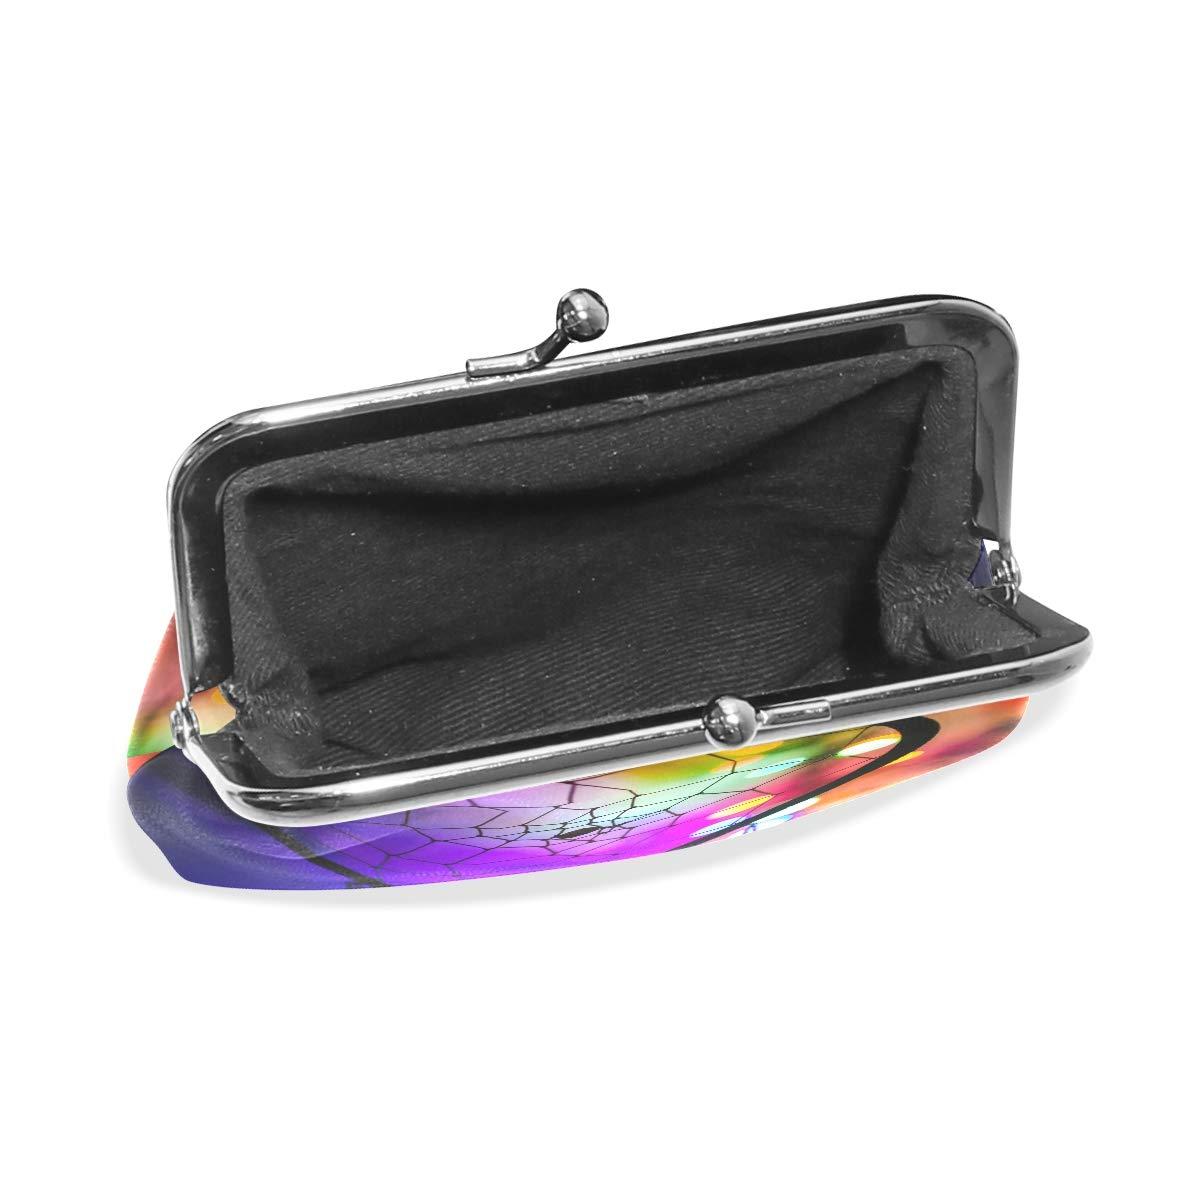 65a335d49e3a MALPLENA Colorful Dream Catcher change purse for women leather purse ...